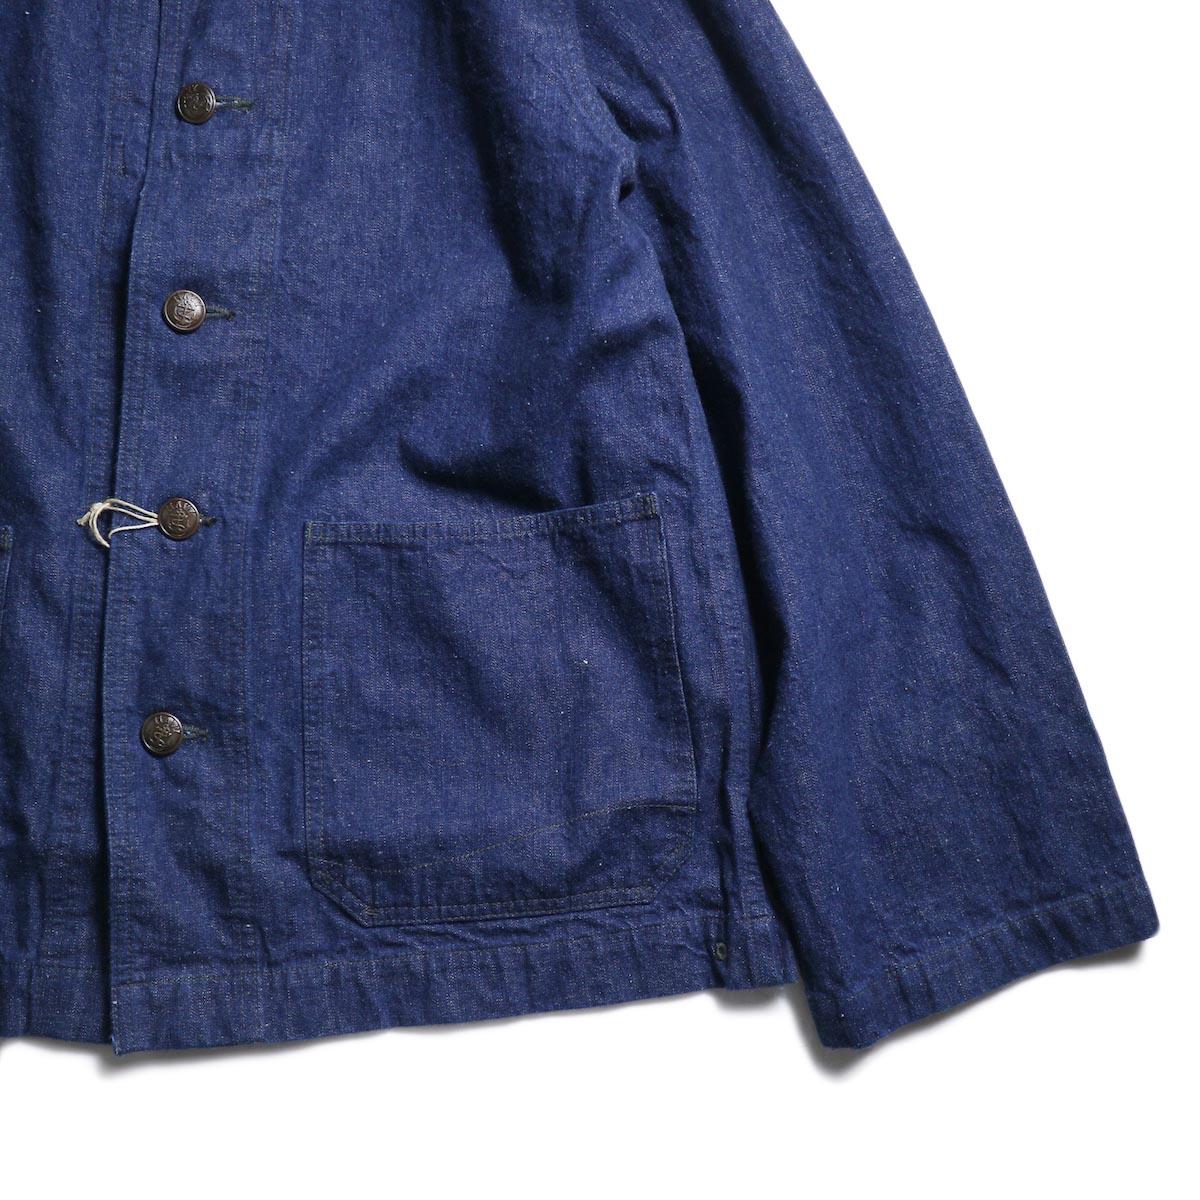 orSlow / US NAVY SHAWL COLLAR JACKET (One Wash)裾、袖